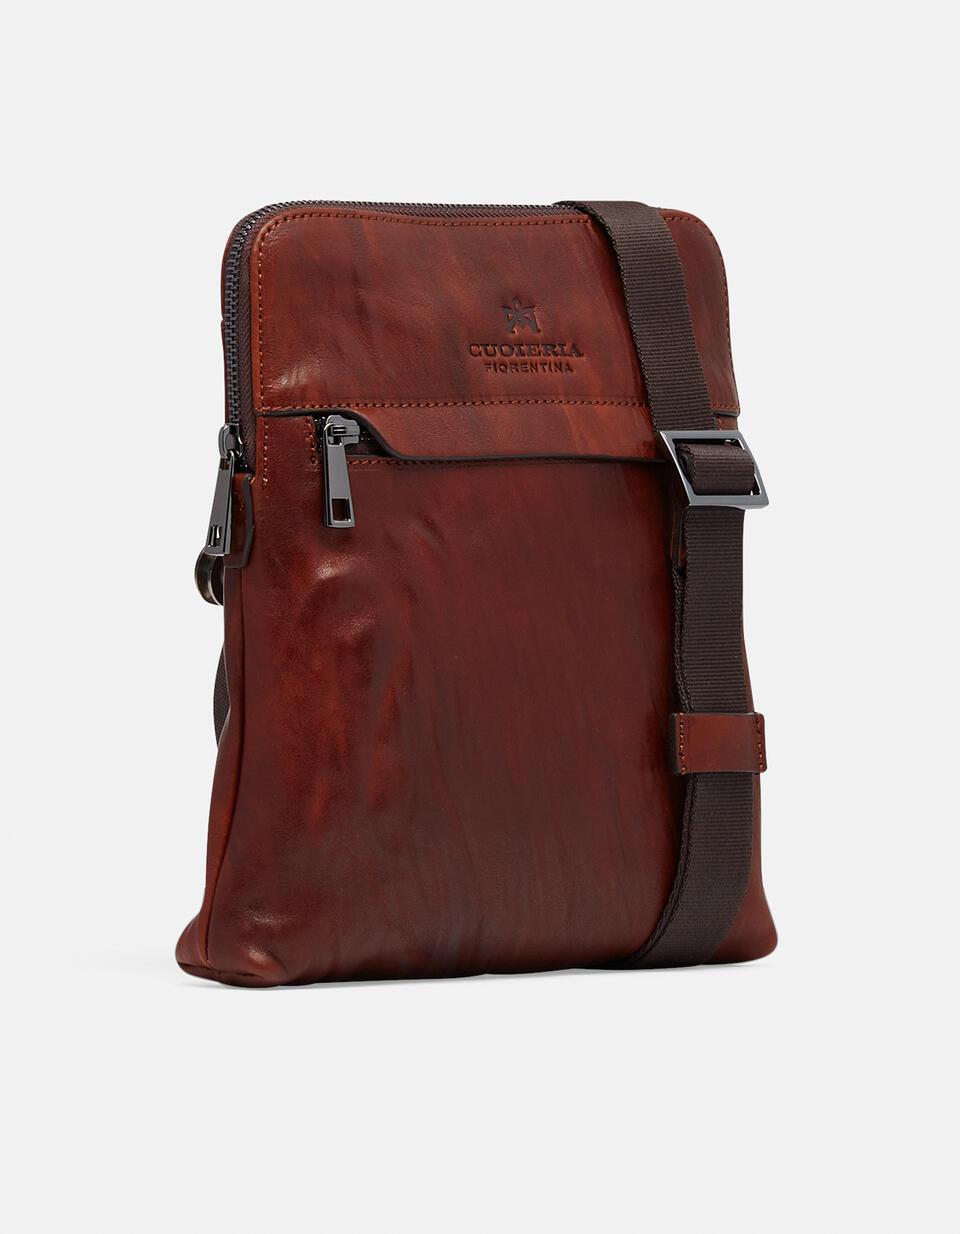 Bourbon iPad bag MARRONE Cuoieria Fiorentina